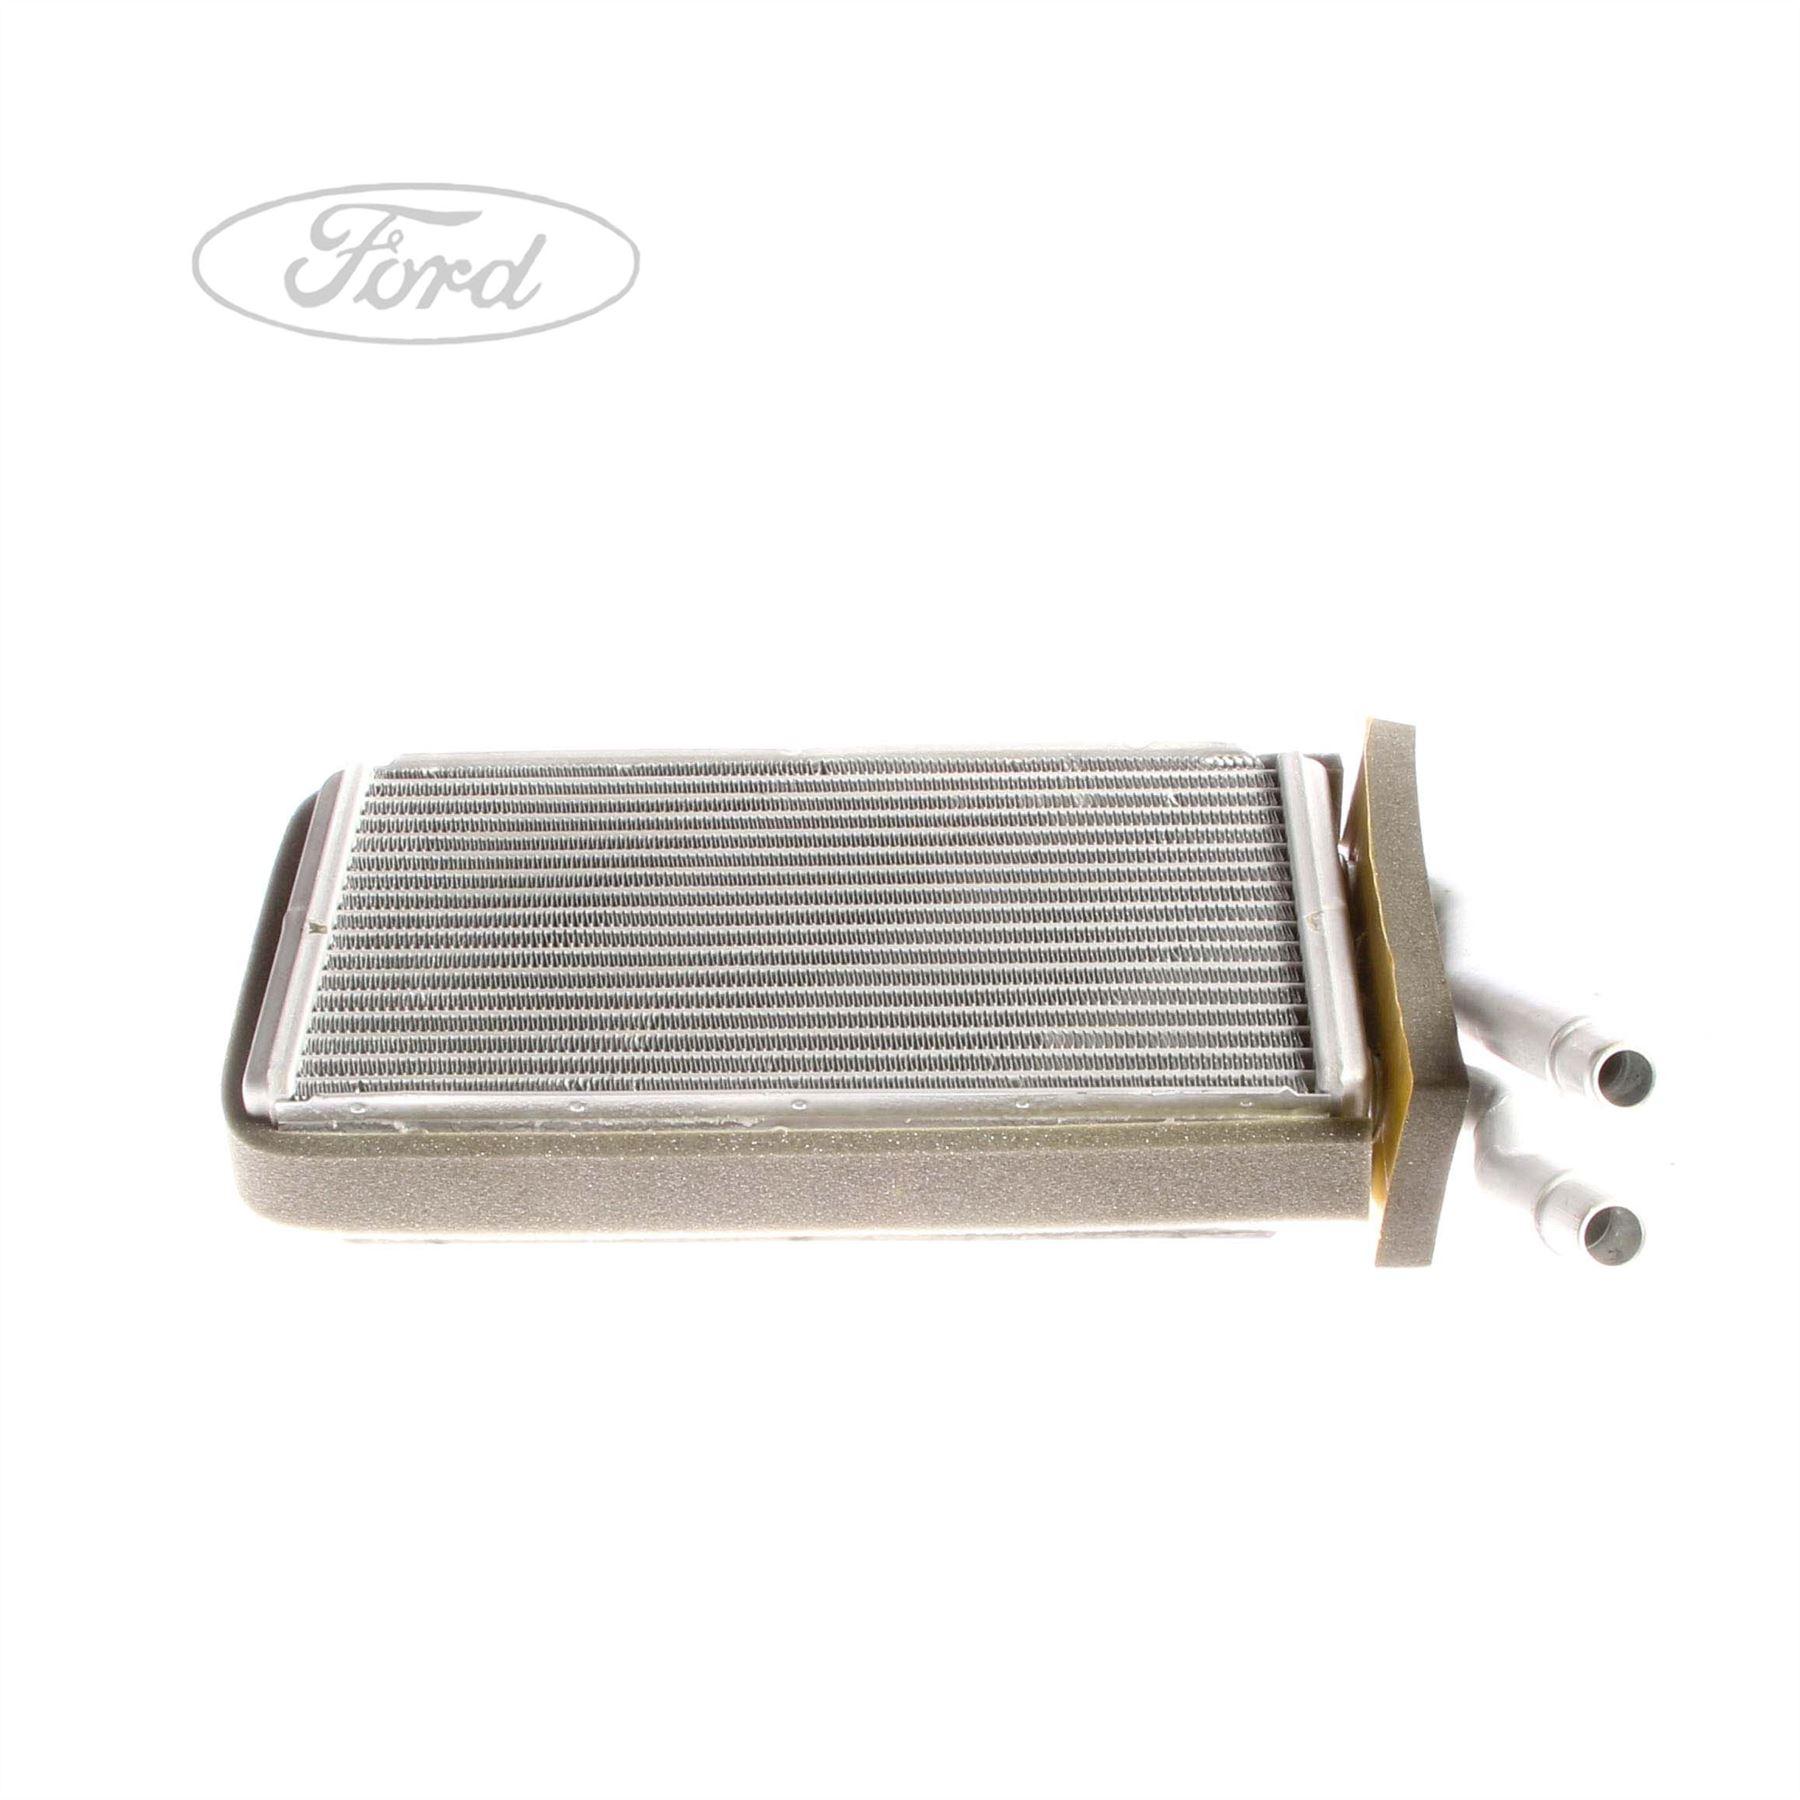 New Radiator Ford Transit MK7 2.2 TDCi 2.3 2.4 TDCi 06-12